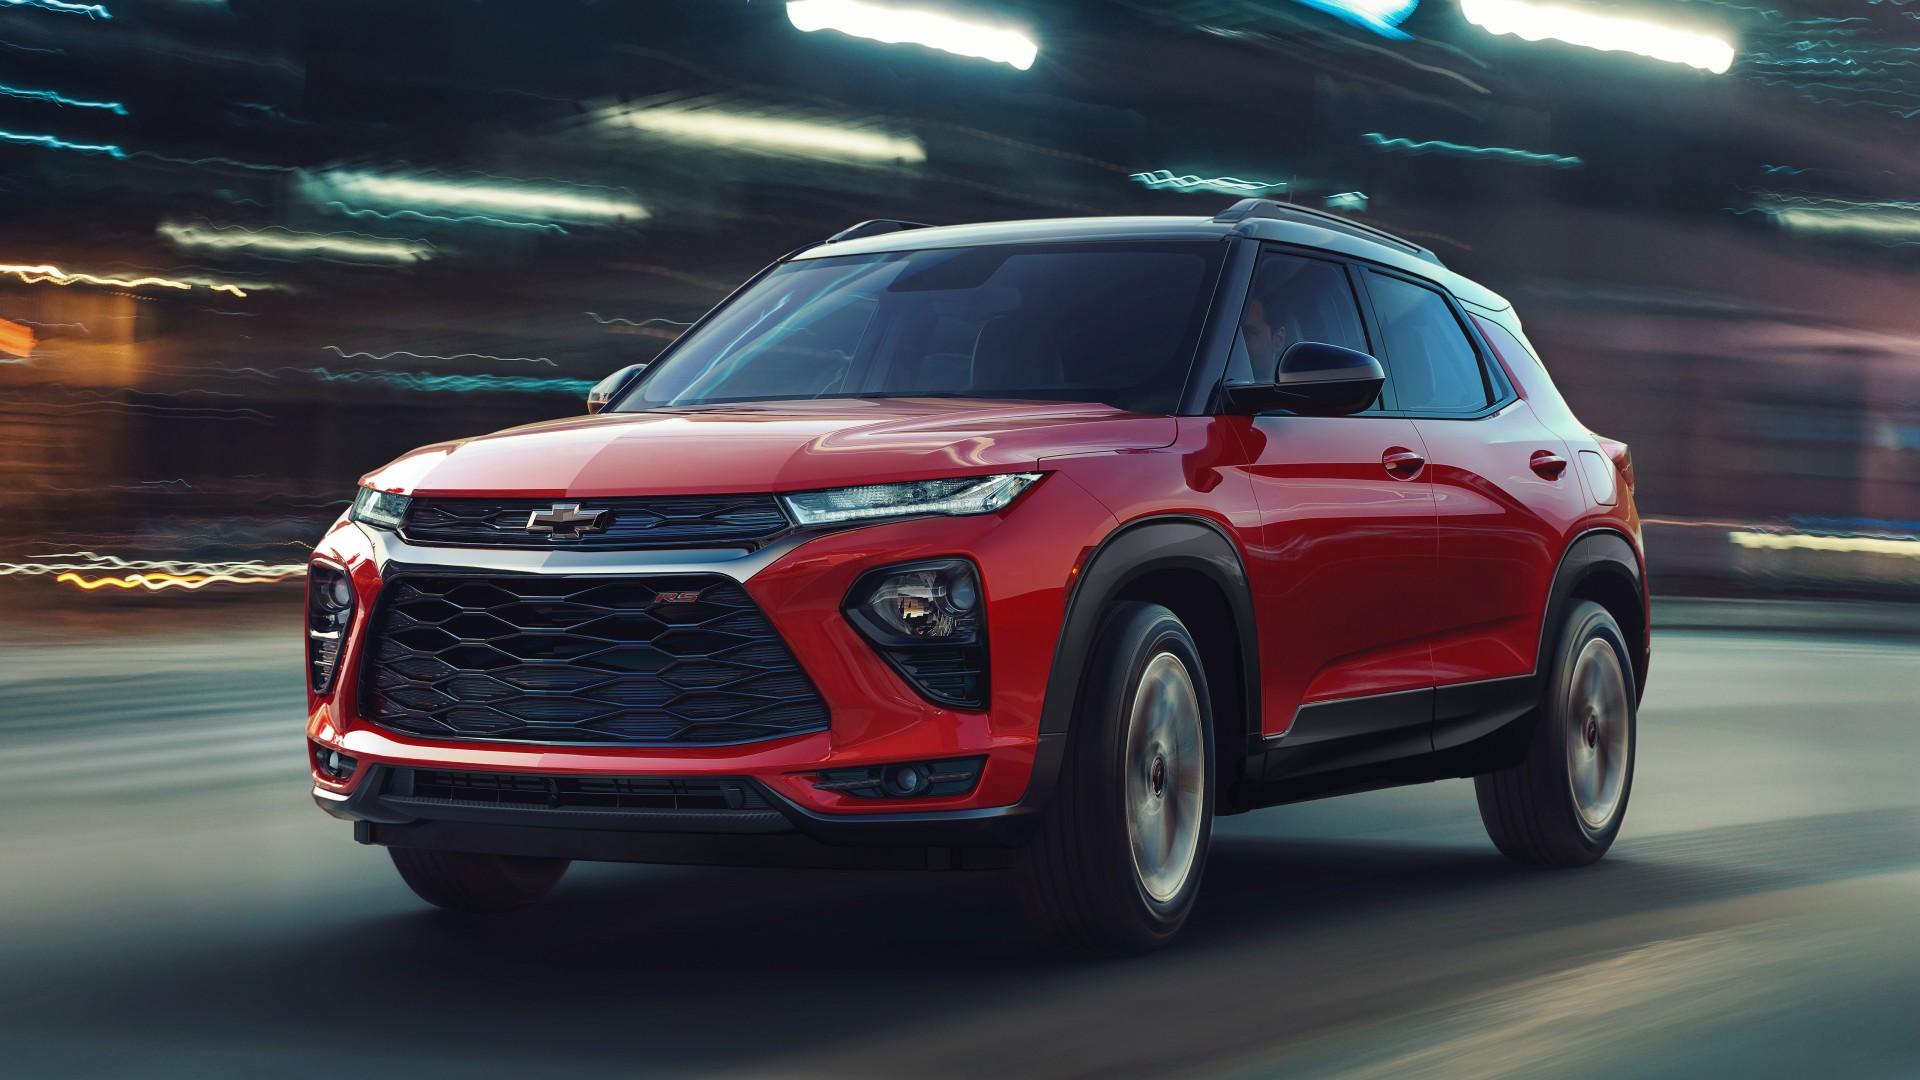 2021 Chevrolet TrailBlazer RS 4K Wallpaper | HD Car ...